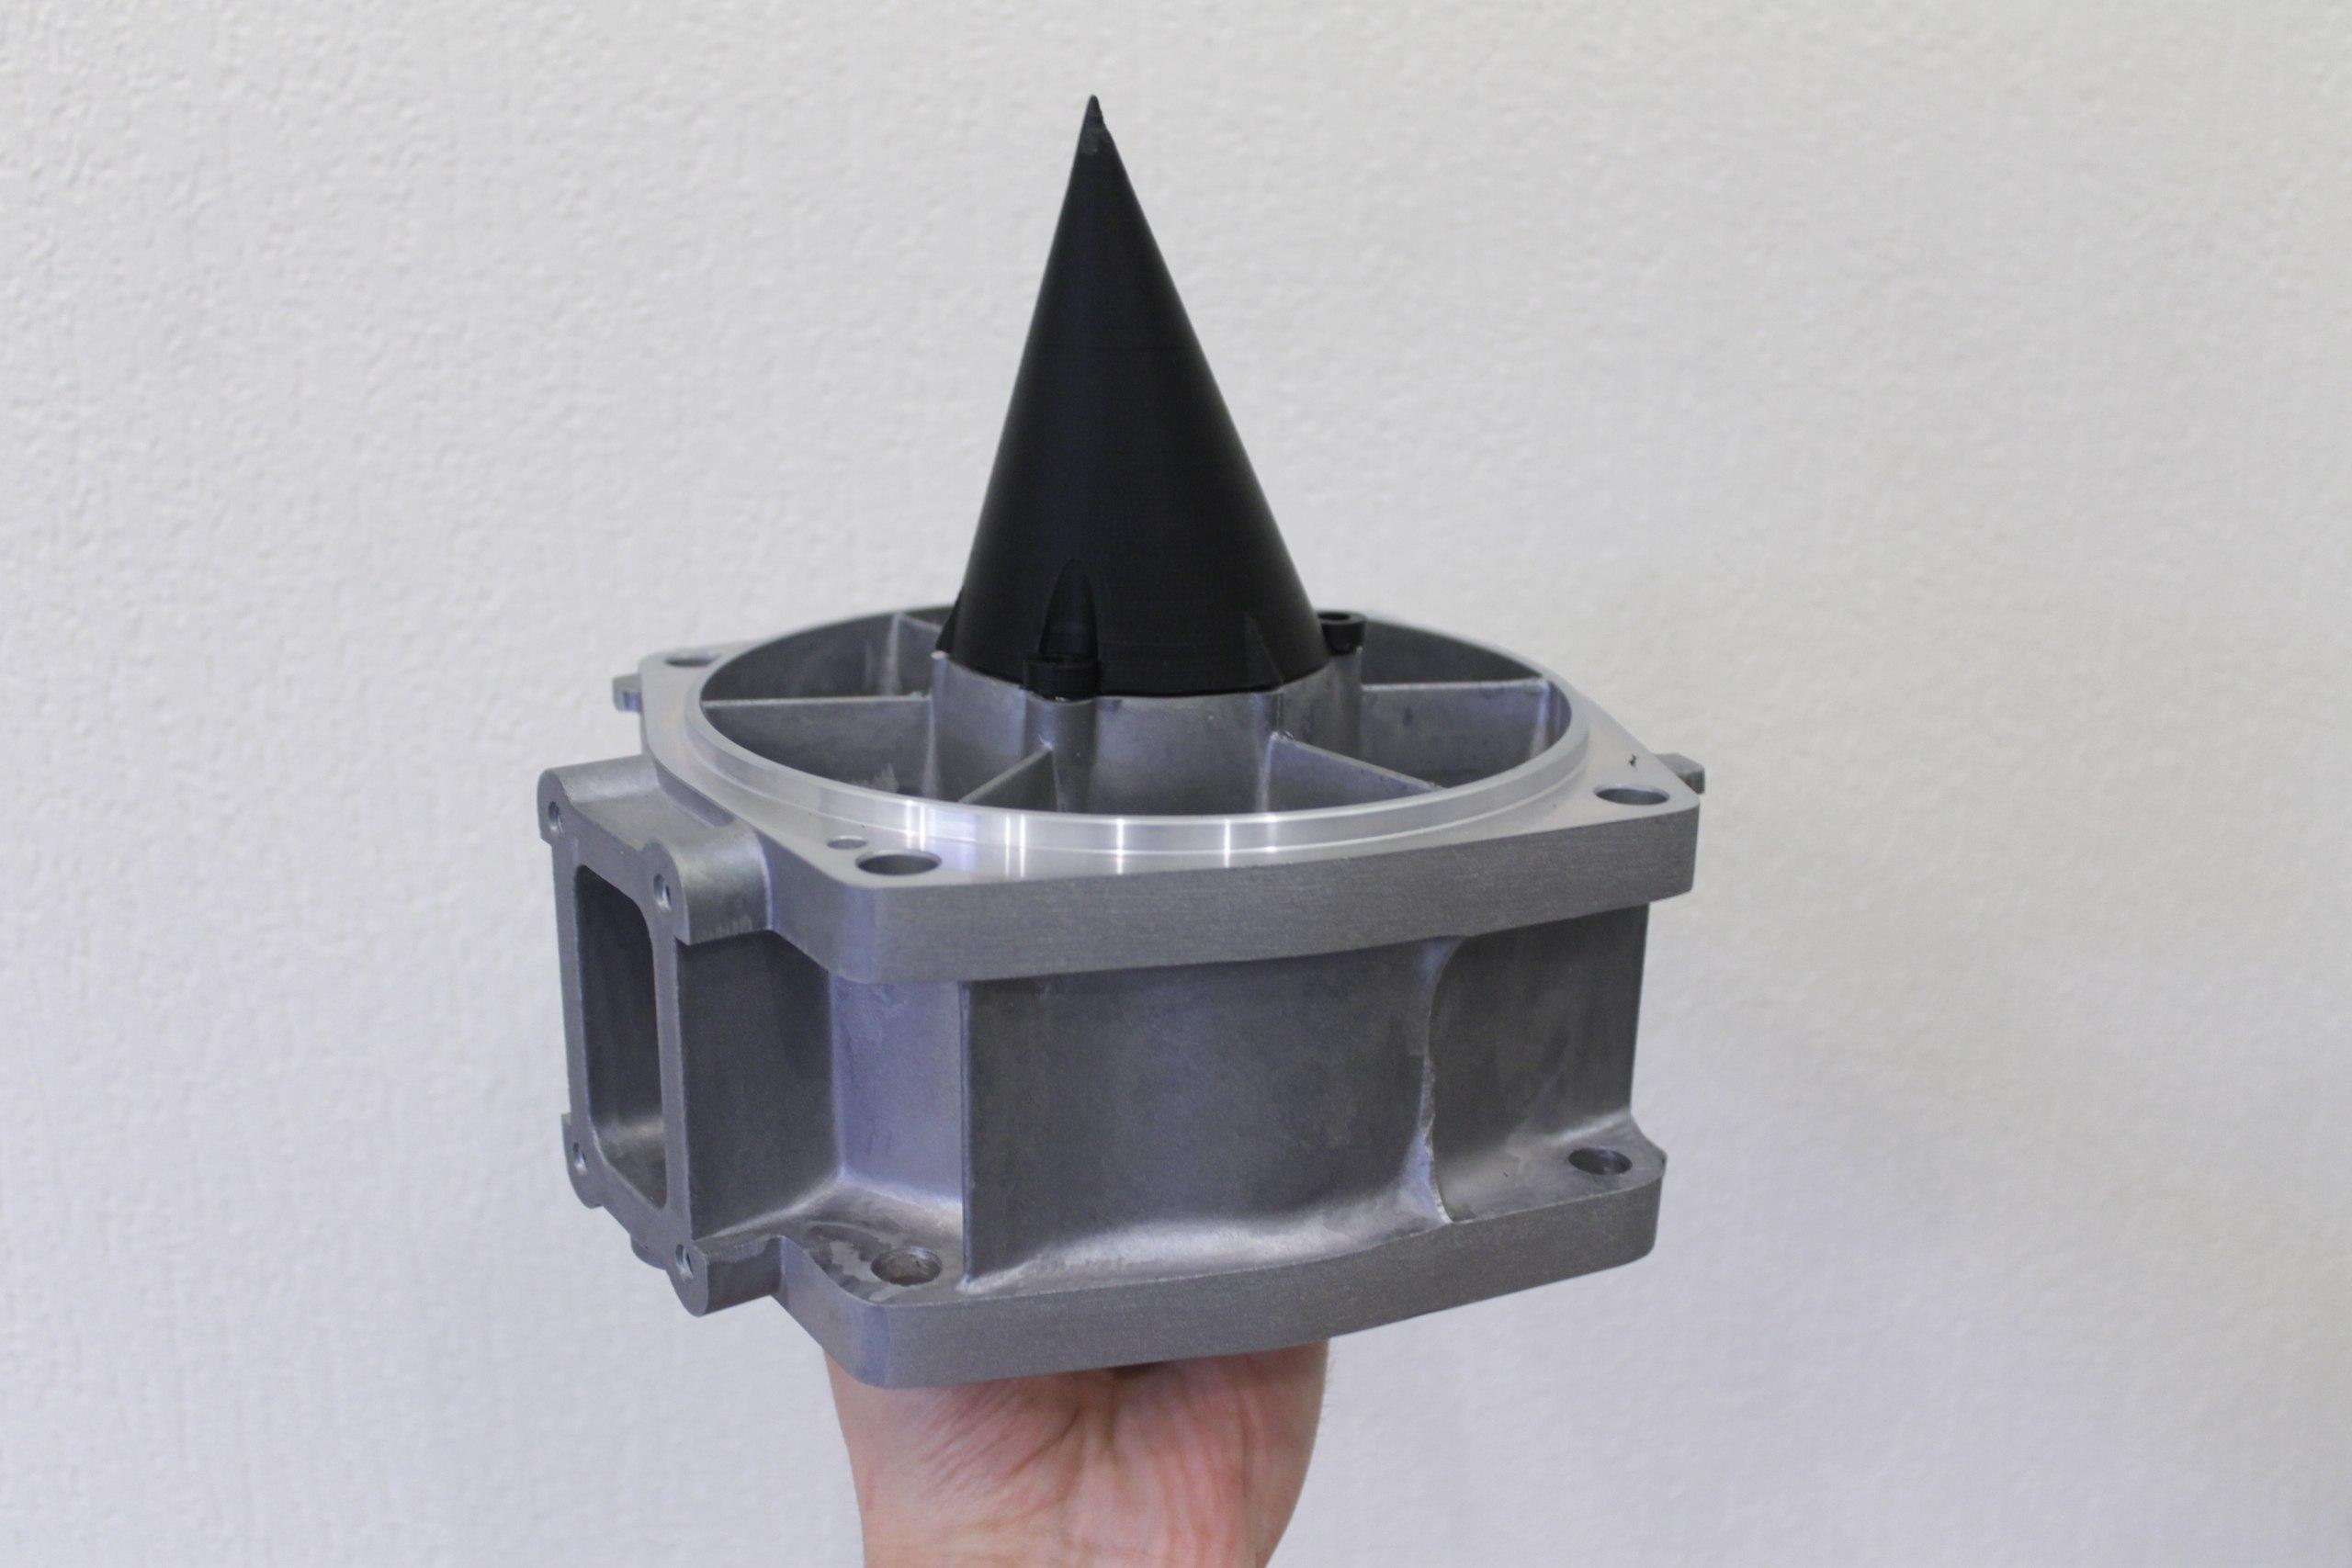 Антикавитационный конус из ABS пластика для двигателя гидроцикла.